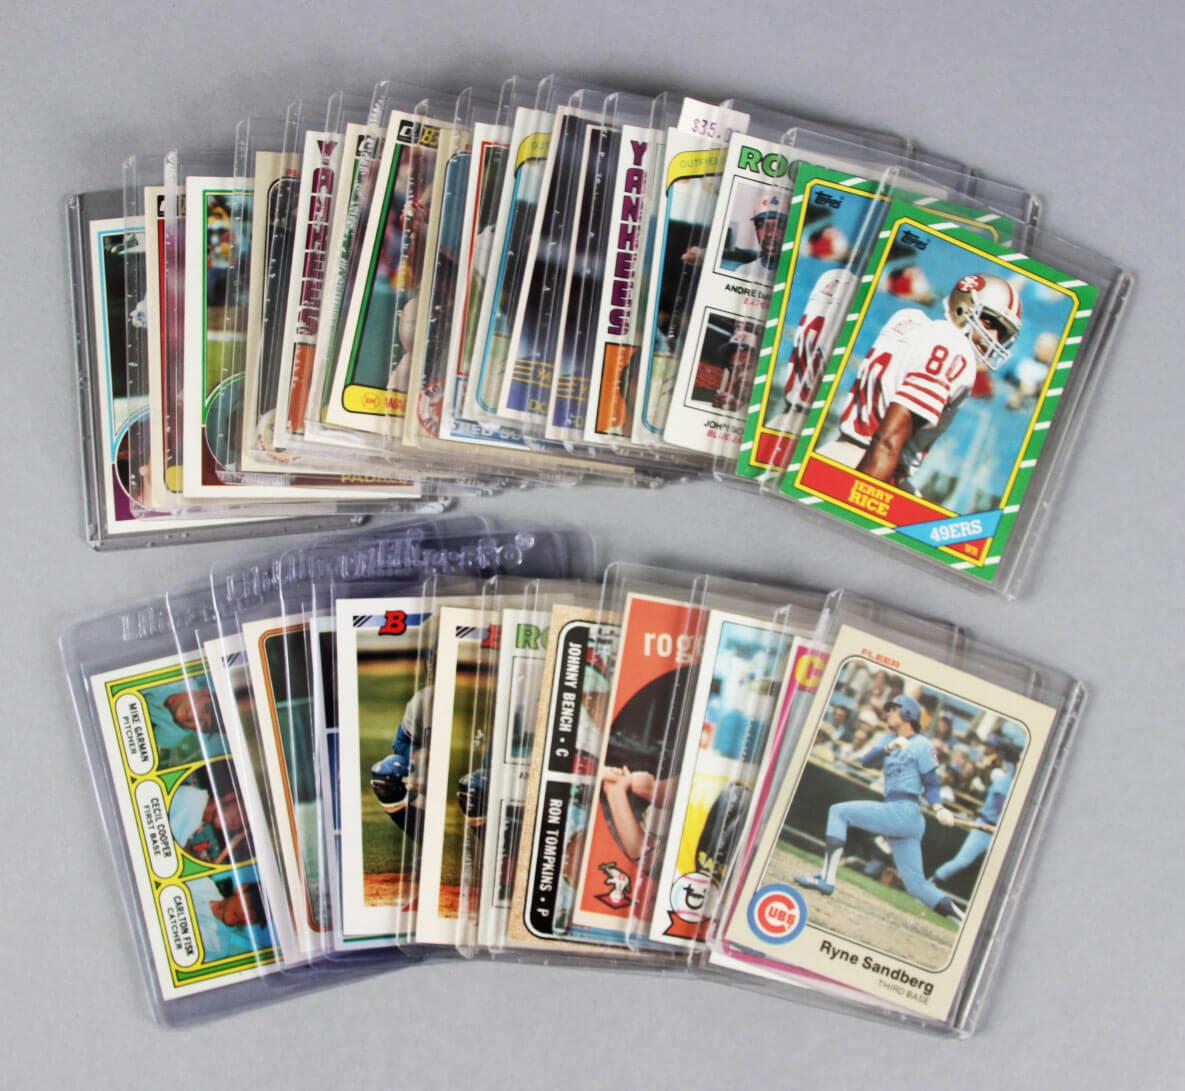 Sports Card Lot (29) Incl. Johnny Bench, Cal Ripken, Jr., Fisk, Staubach, Gwynn, Piazza Rookies etc.